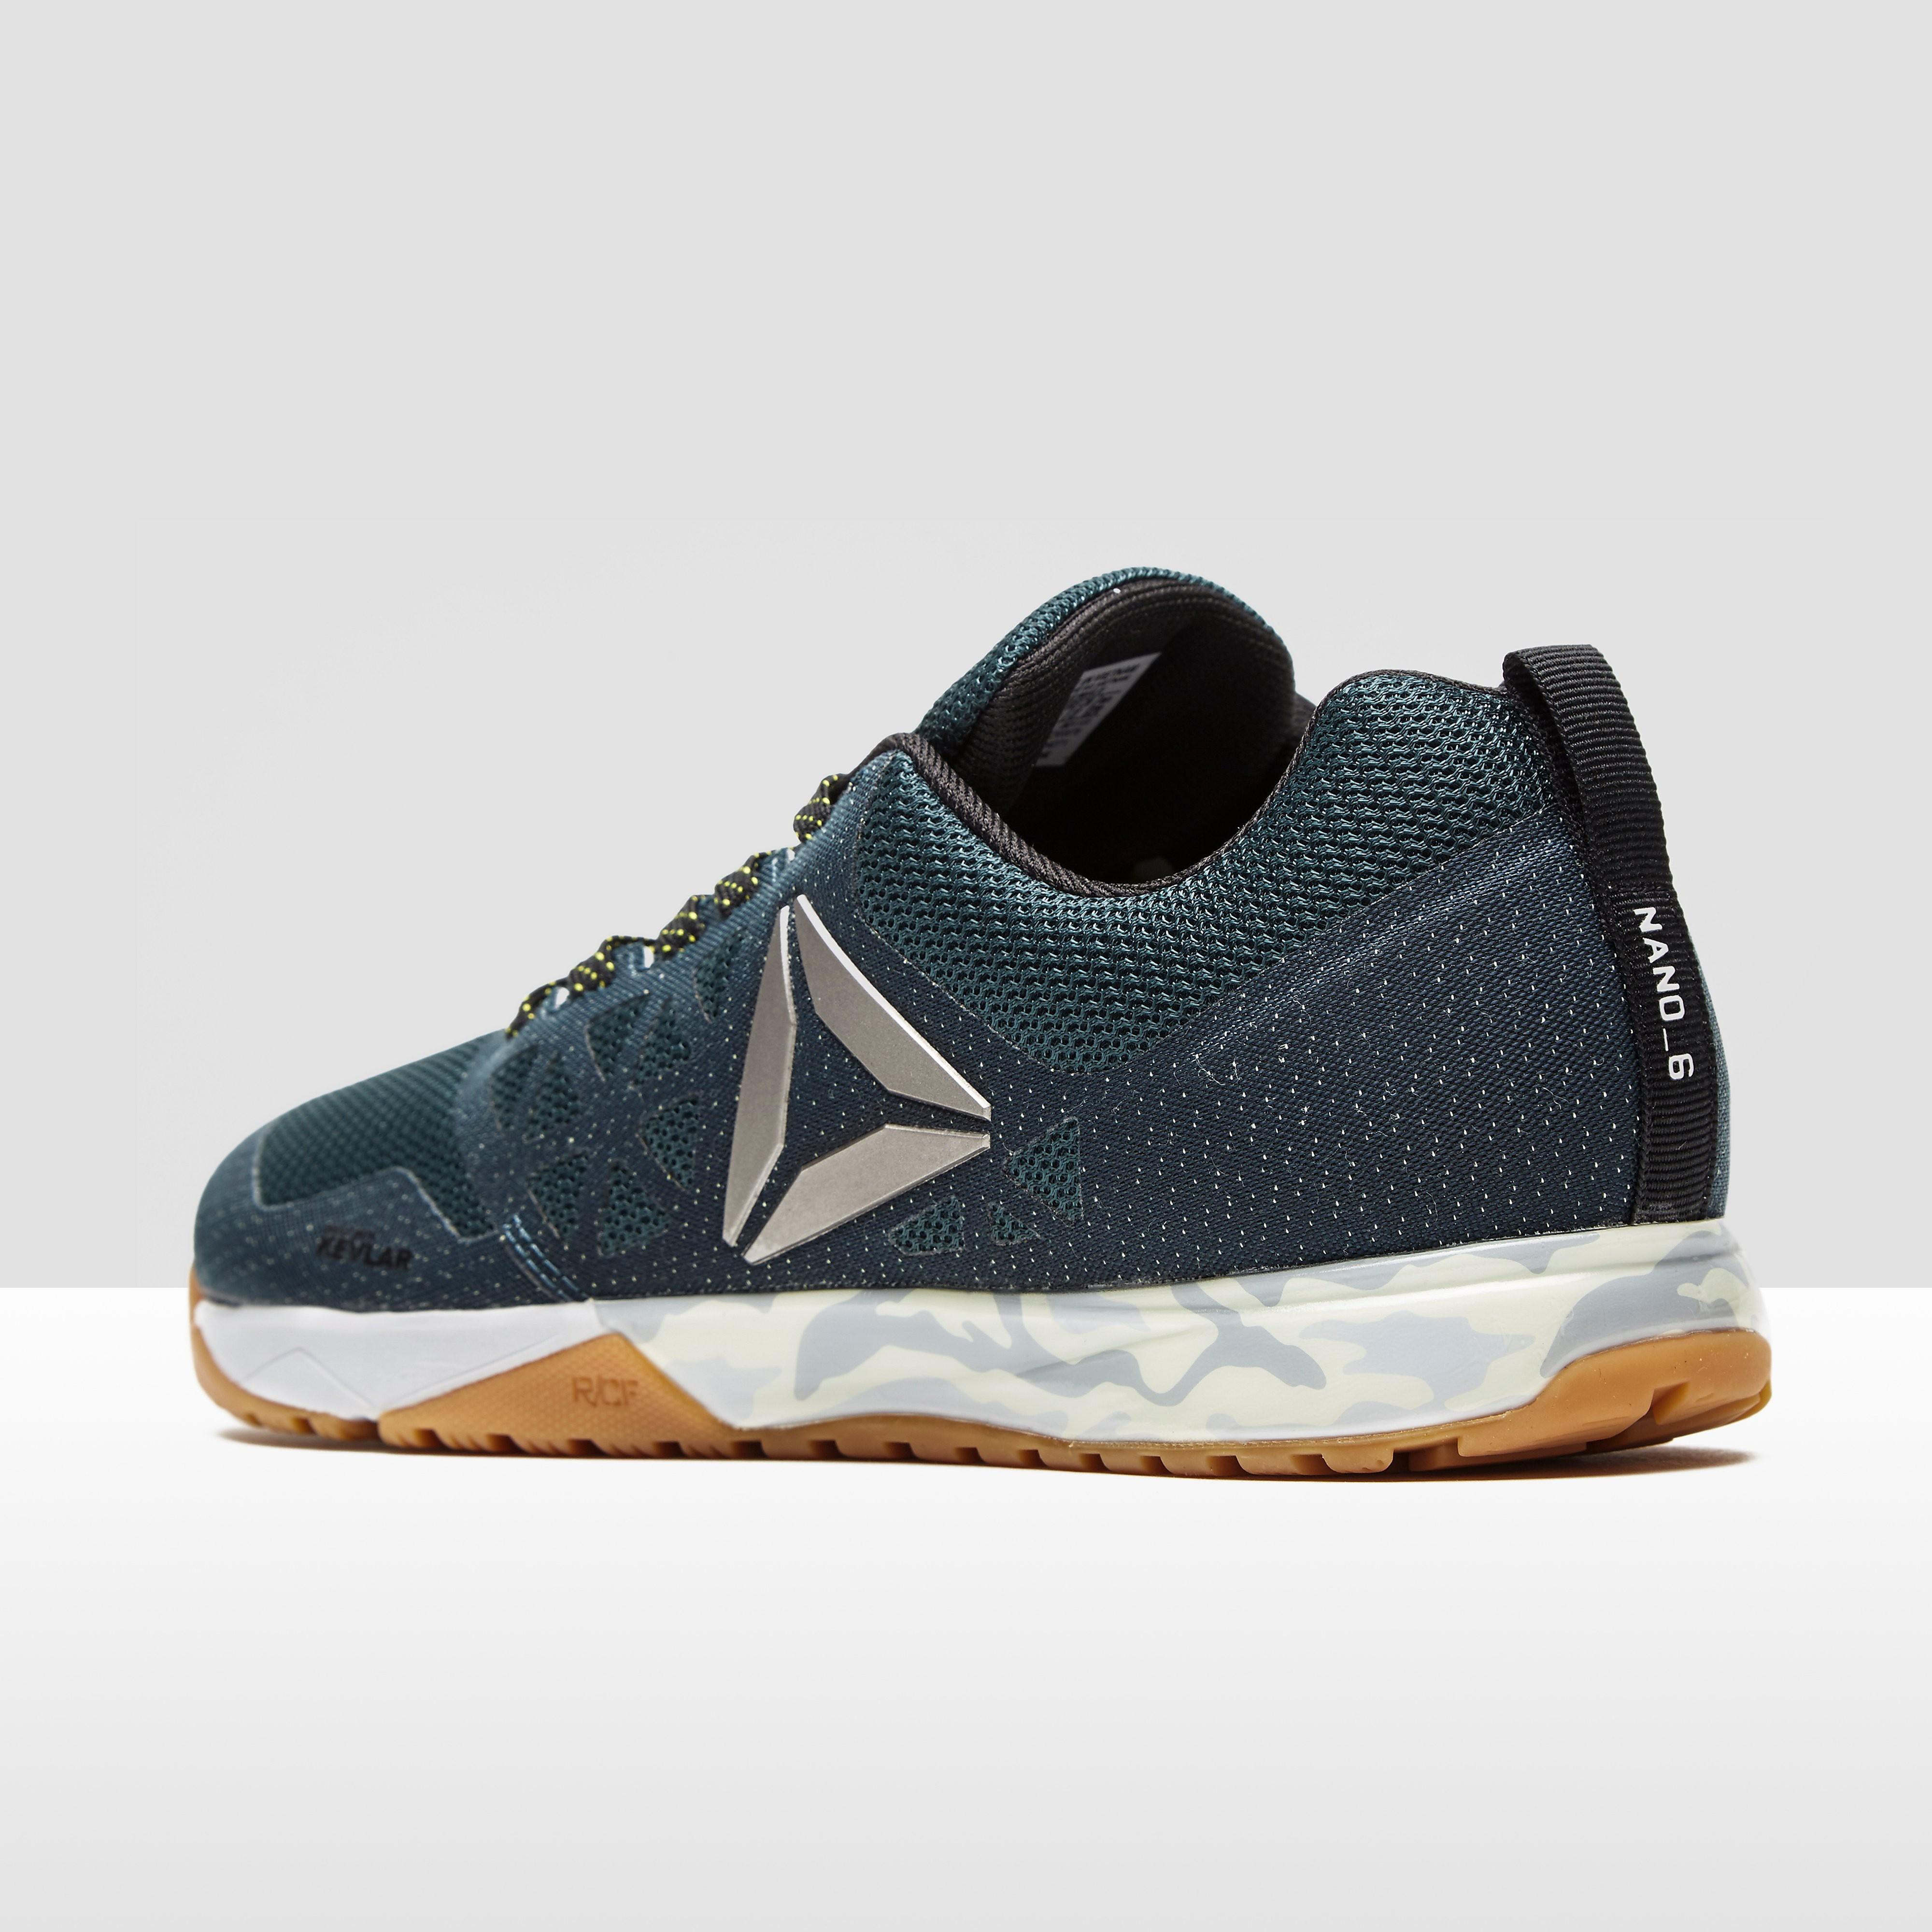 Reebok Men's Nano 6.0 CrossFit training shoe